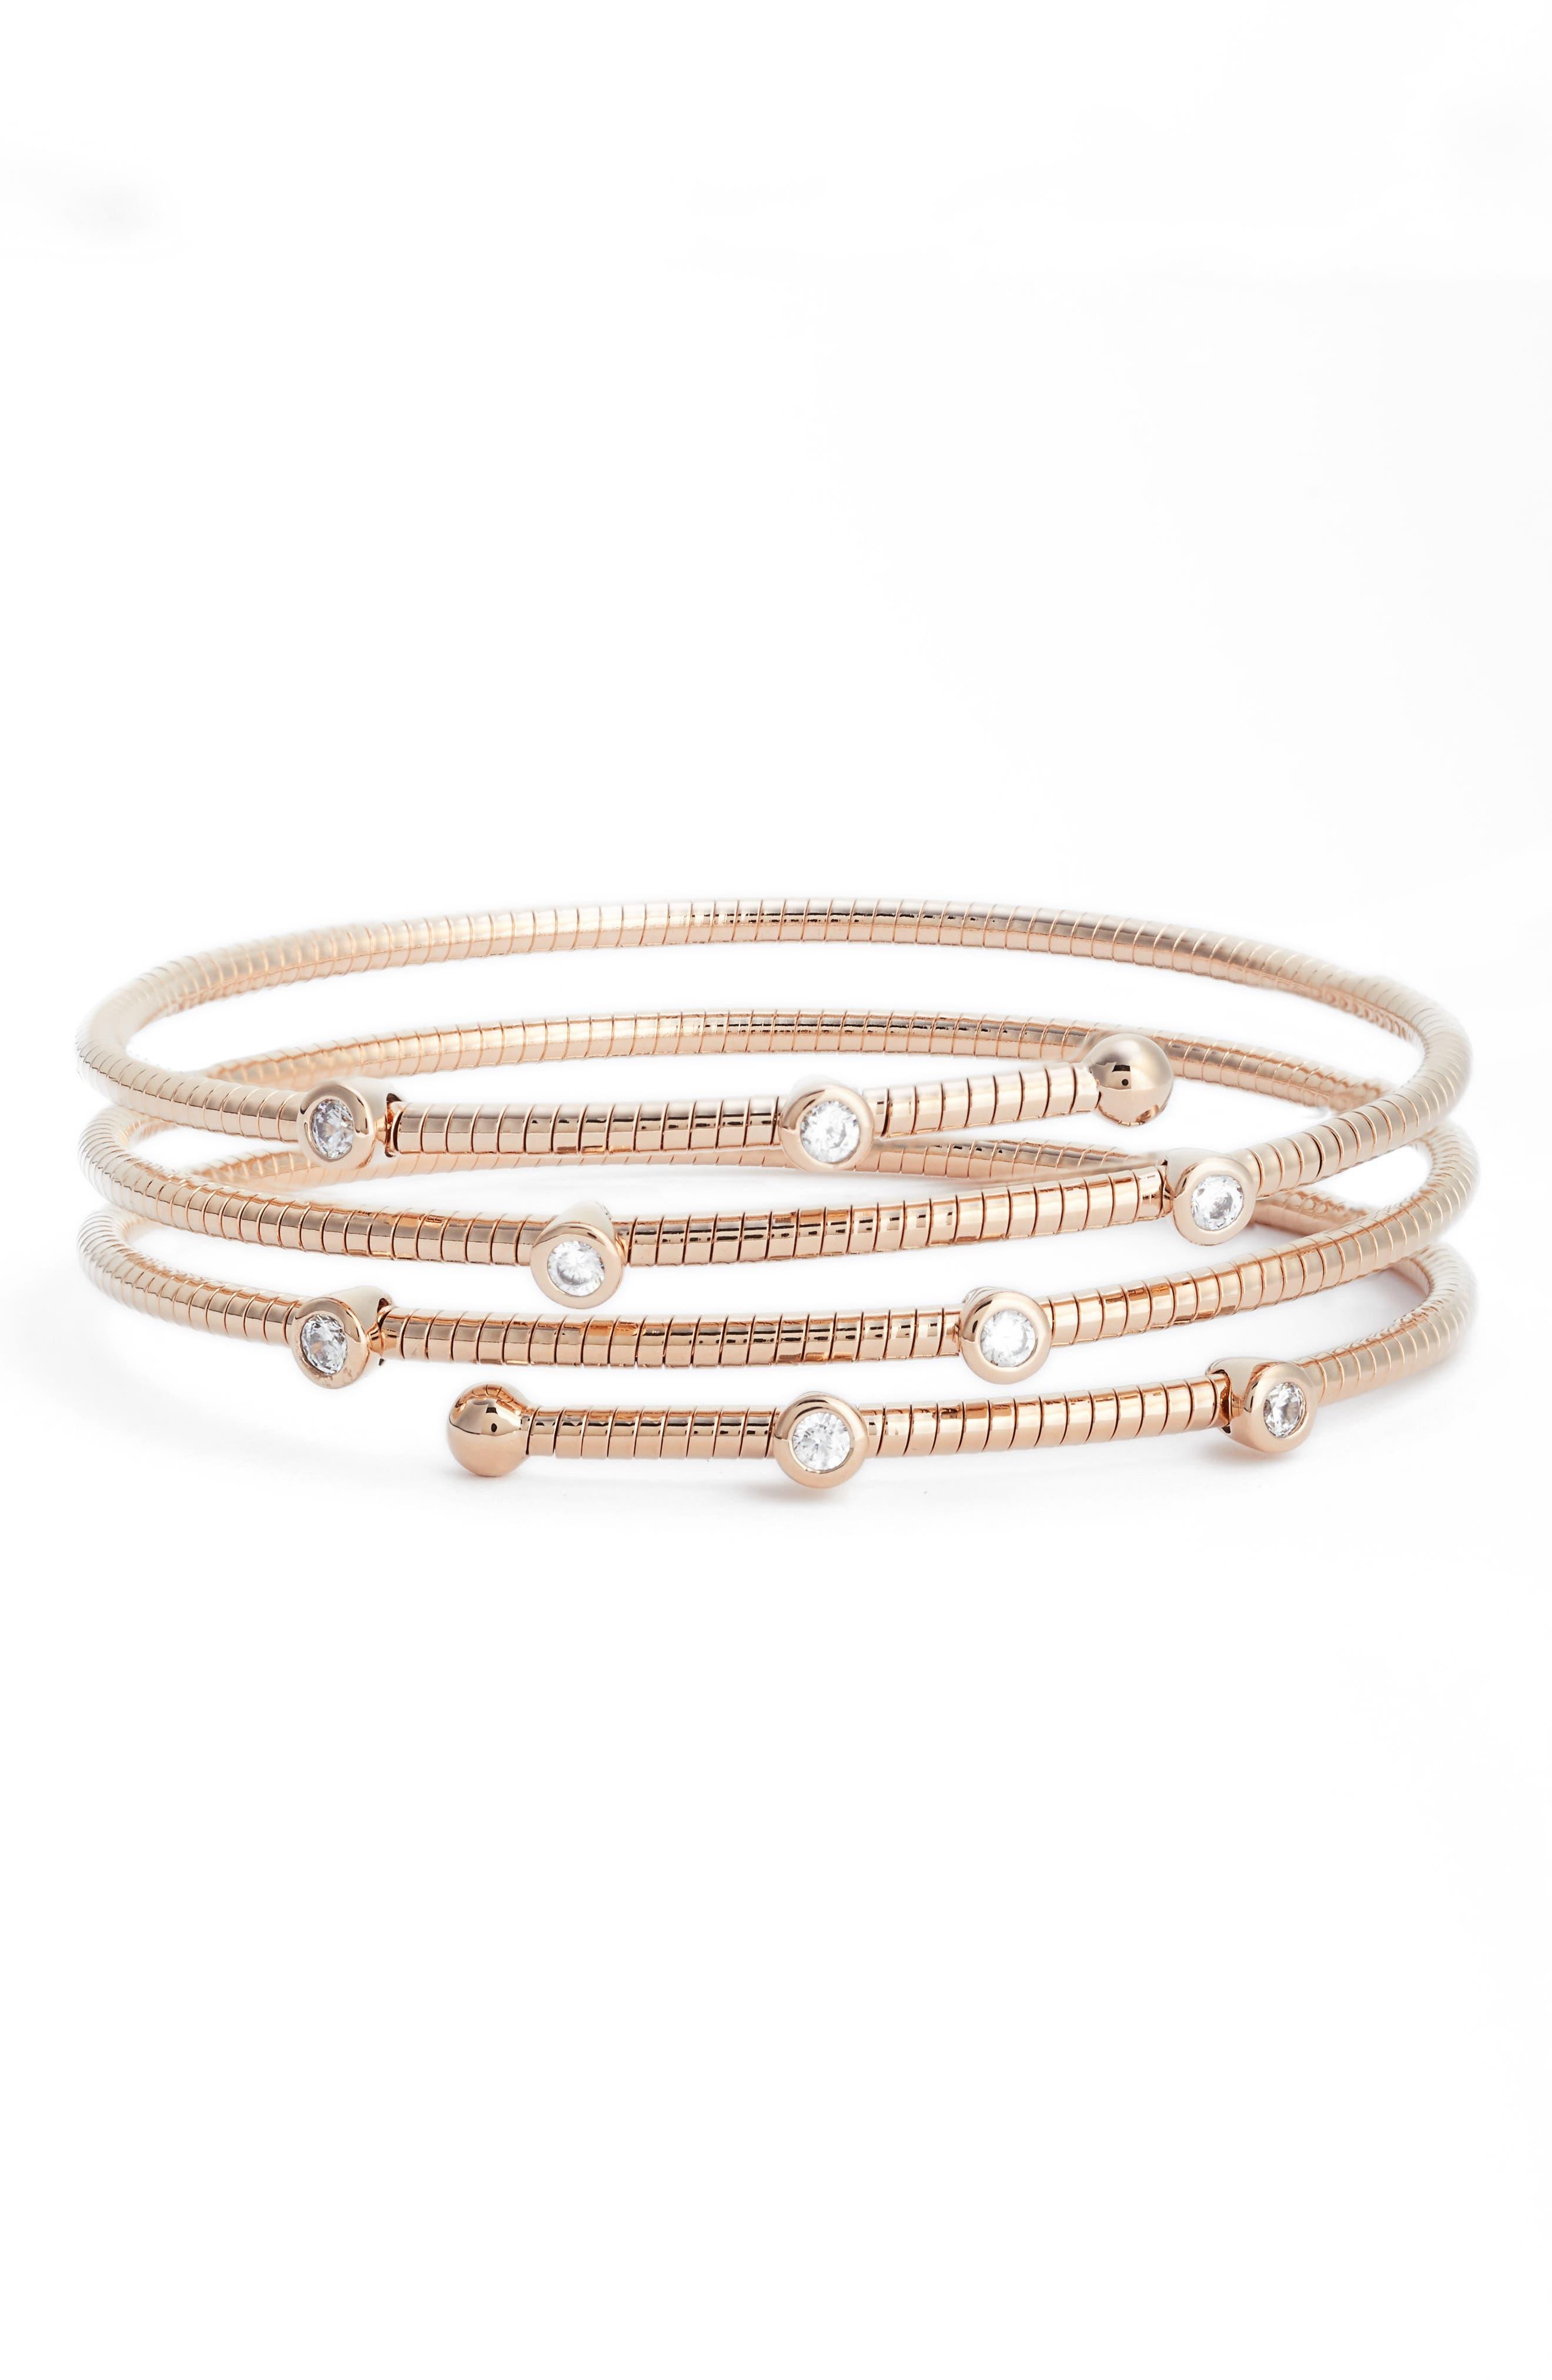 Cubic Zirconia Spiral Wrap Bracelet,                         Main,                         color, Rose Gold/ Clear